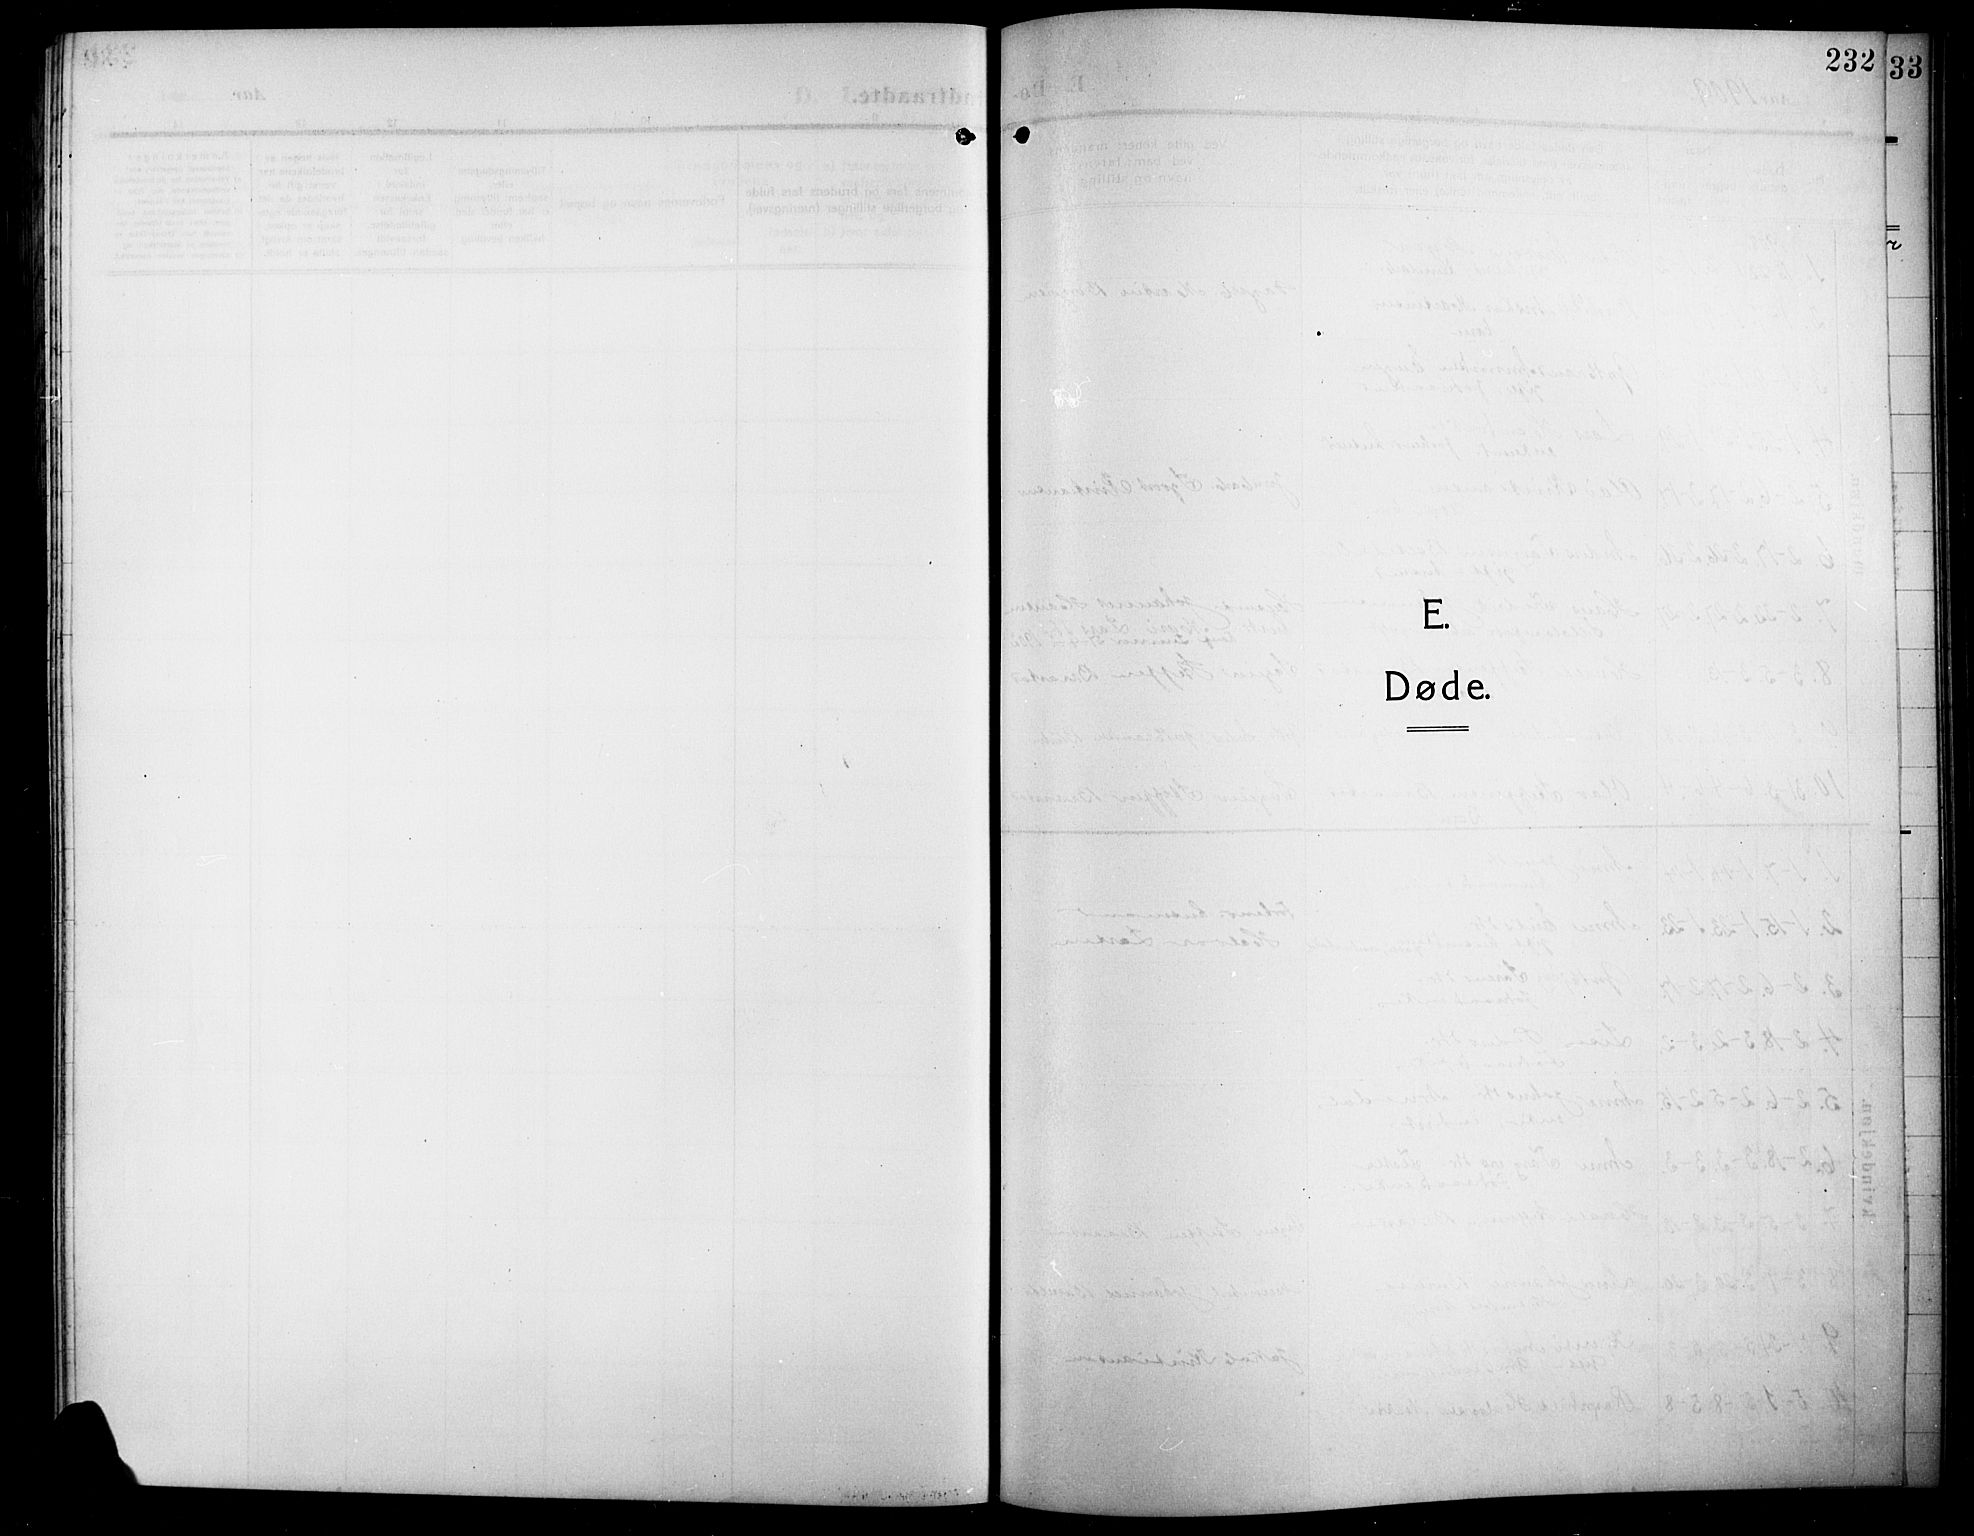 SAH, Lunner prestekontor, H/Ha/Hab/L0001: Klokkerbok nr. 1, 1909-1922, s. 232